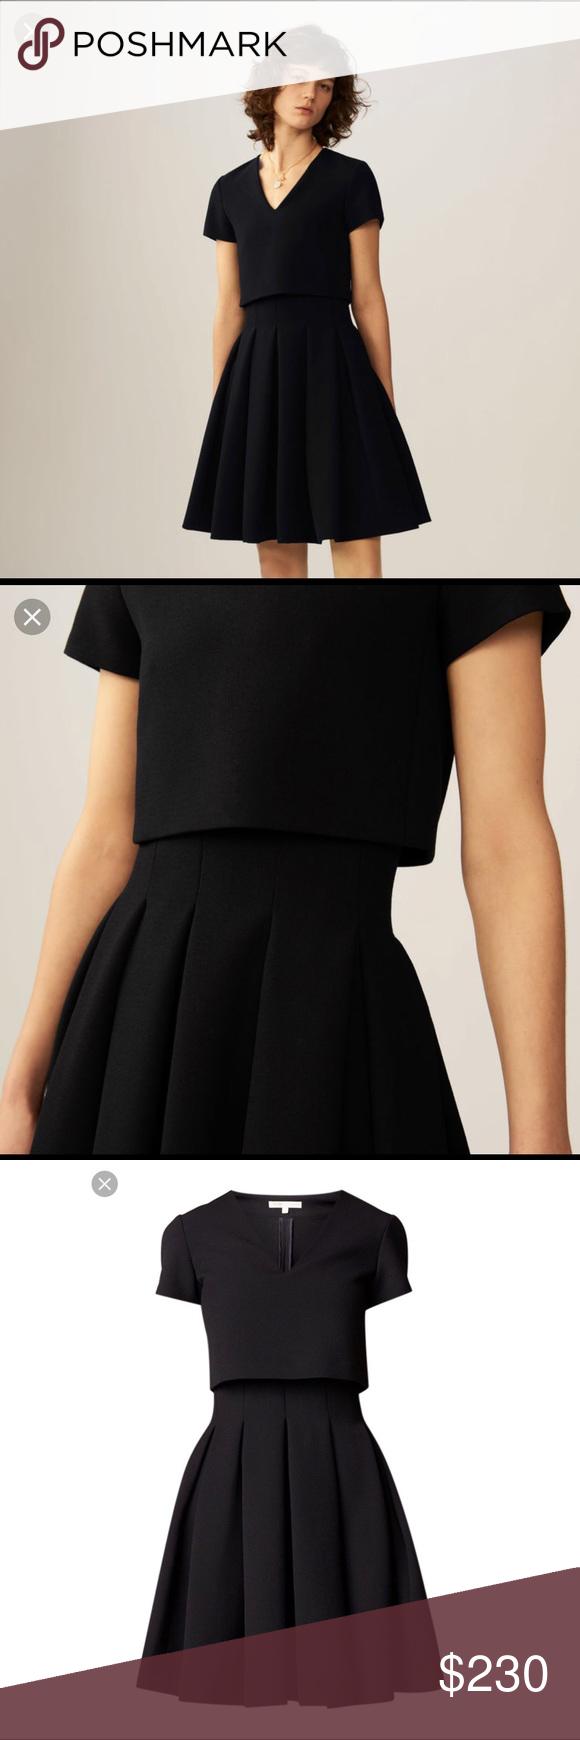 Maje Little Black Dress Dresses Little Black Dress Maje Dress [ 1740 x 580 Pixel ]